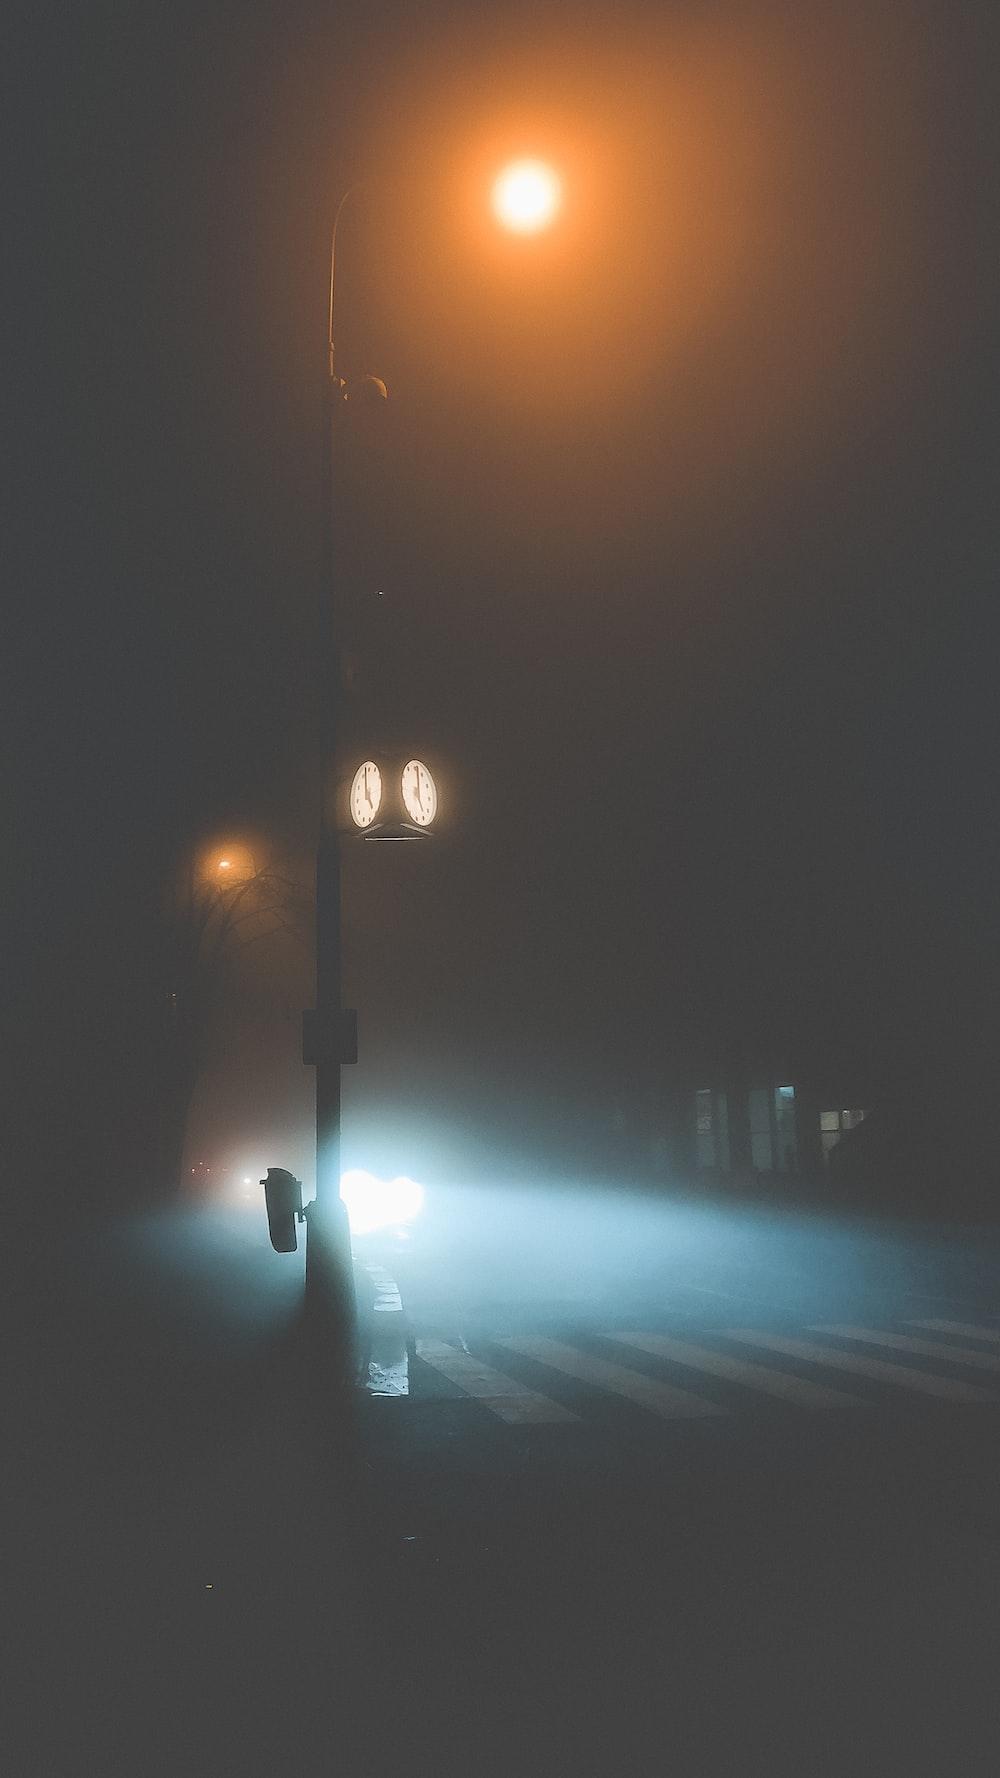 black street light turned on during night time